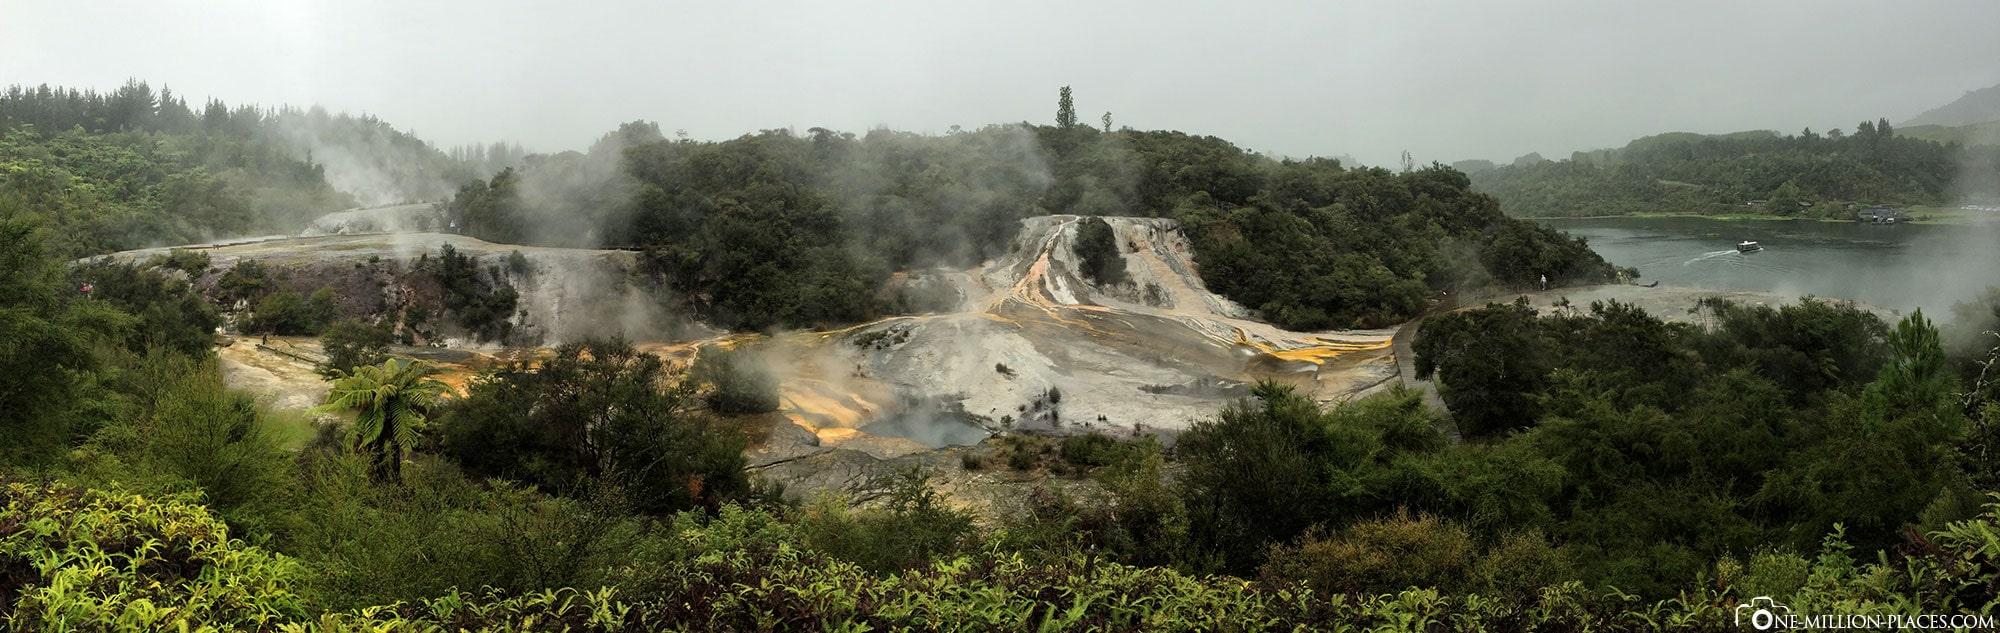 Panorama, Orakei Korako, Neuseeland, Geothermalregion, Auf eigene Faust, Reisebericht